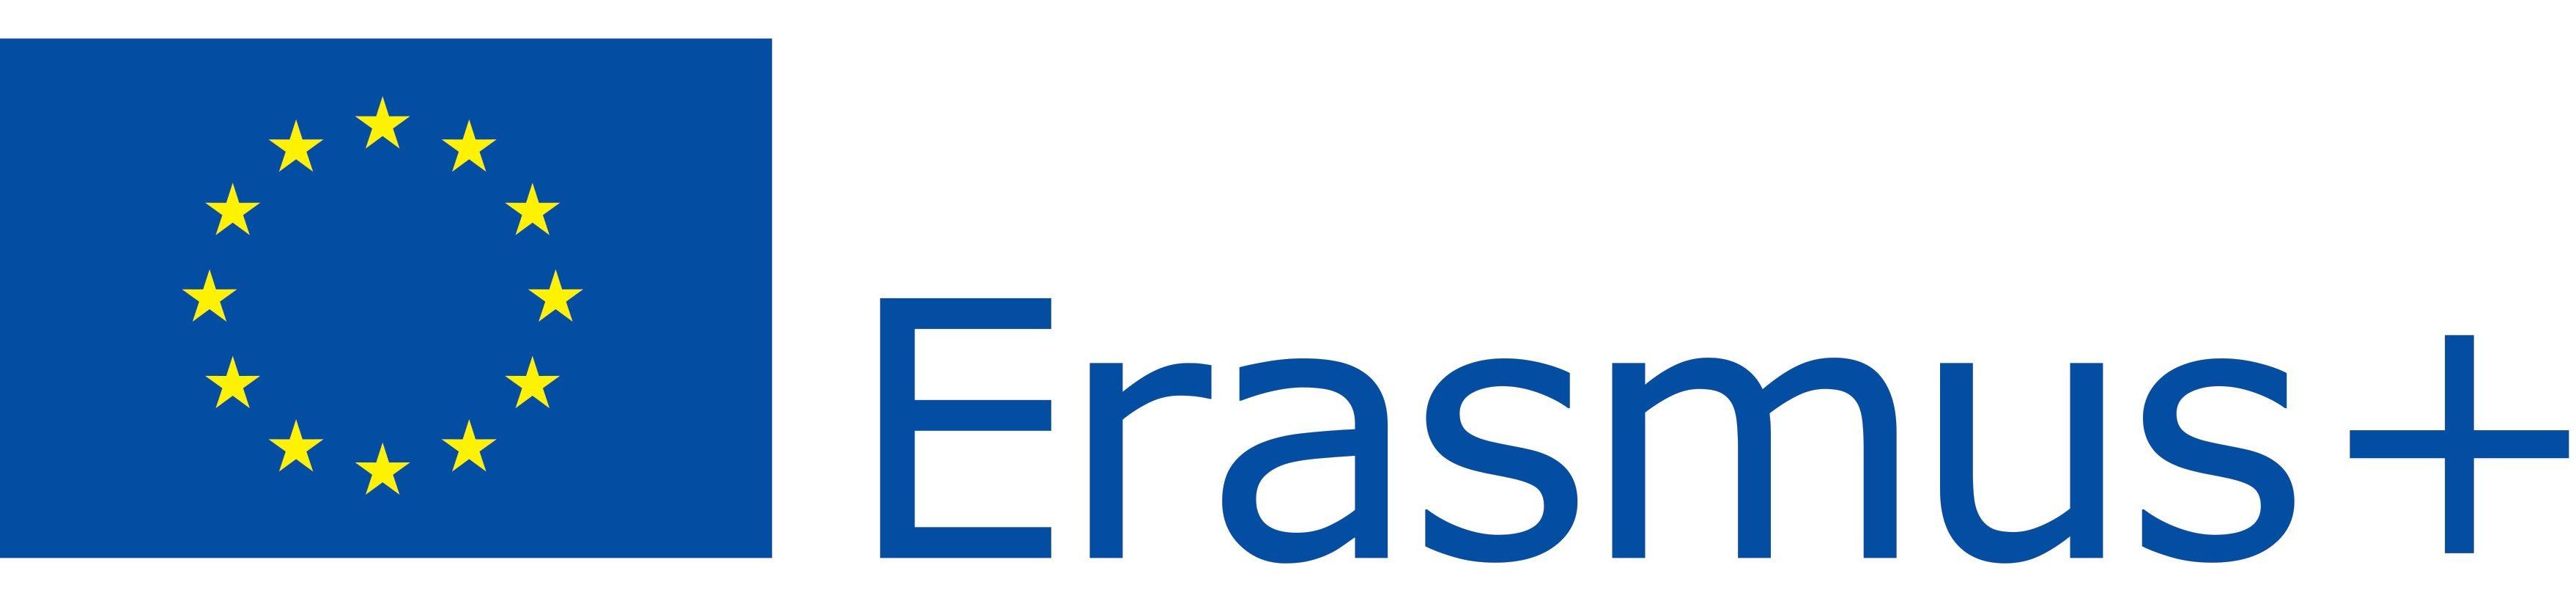 erasmus-logo_938880.jpg